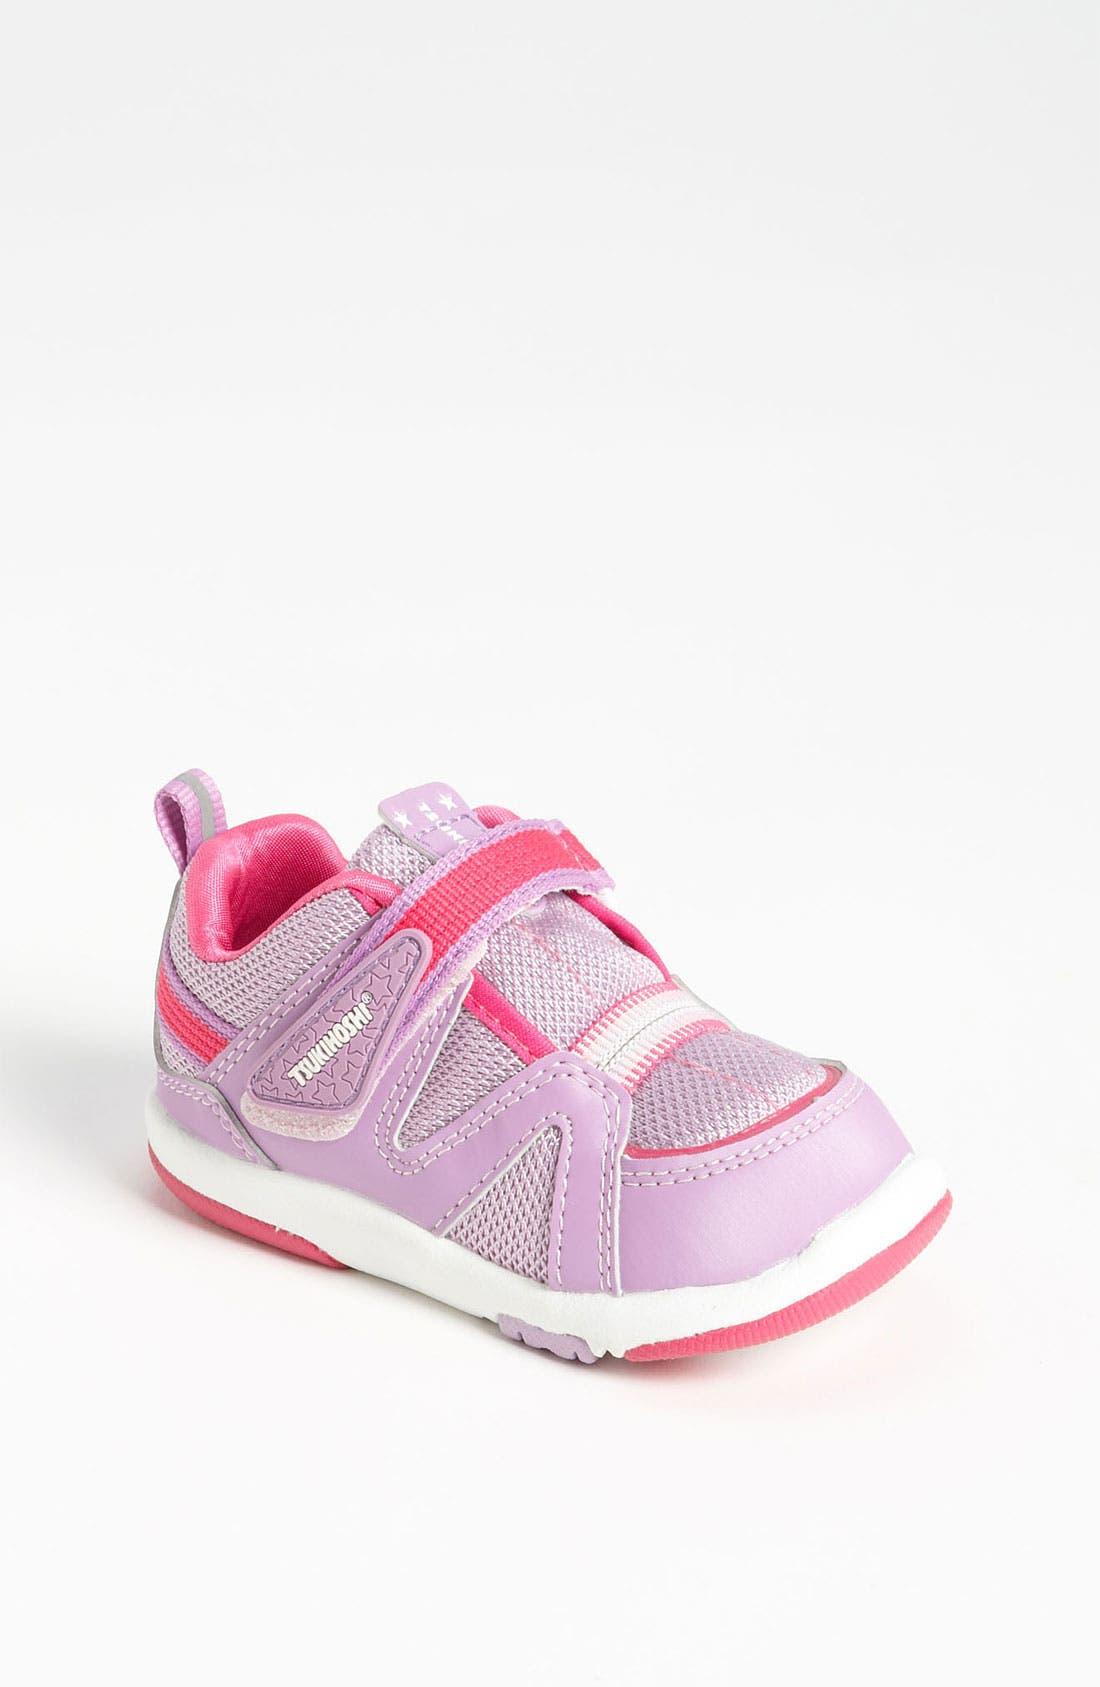 Main Image - Tsukihoshi 'Baby 03' Sneaker (Walker)